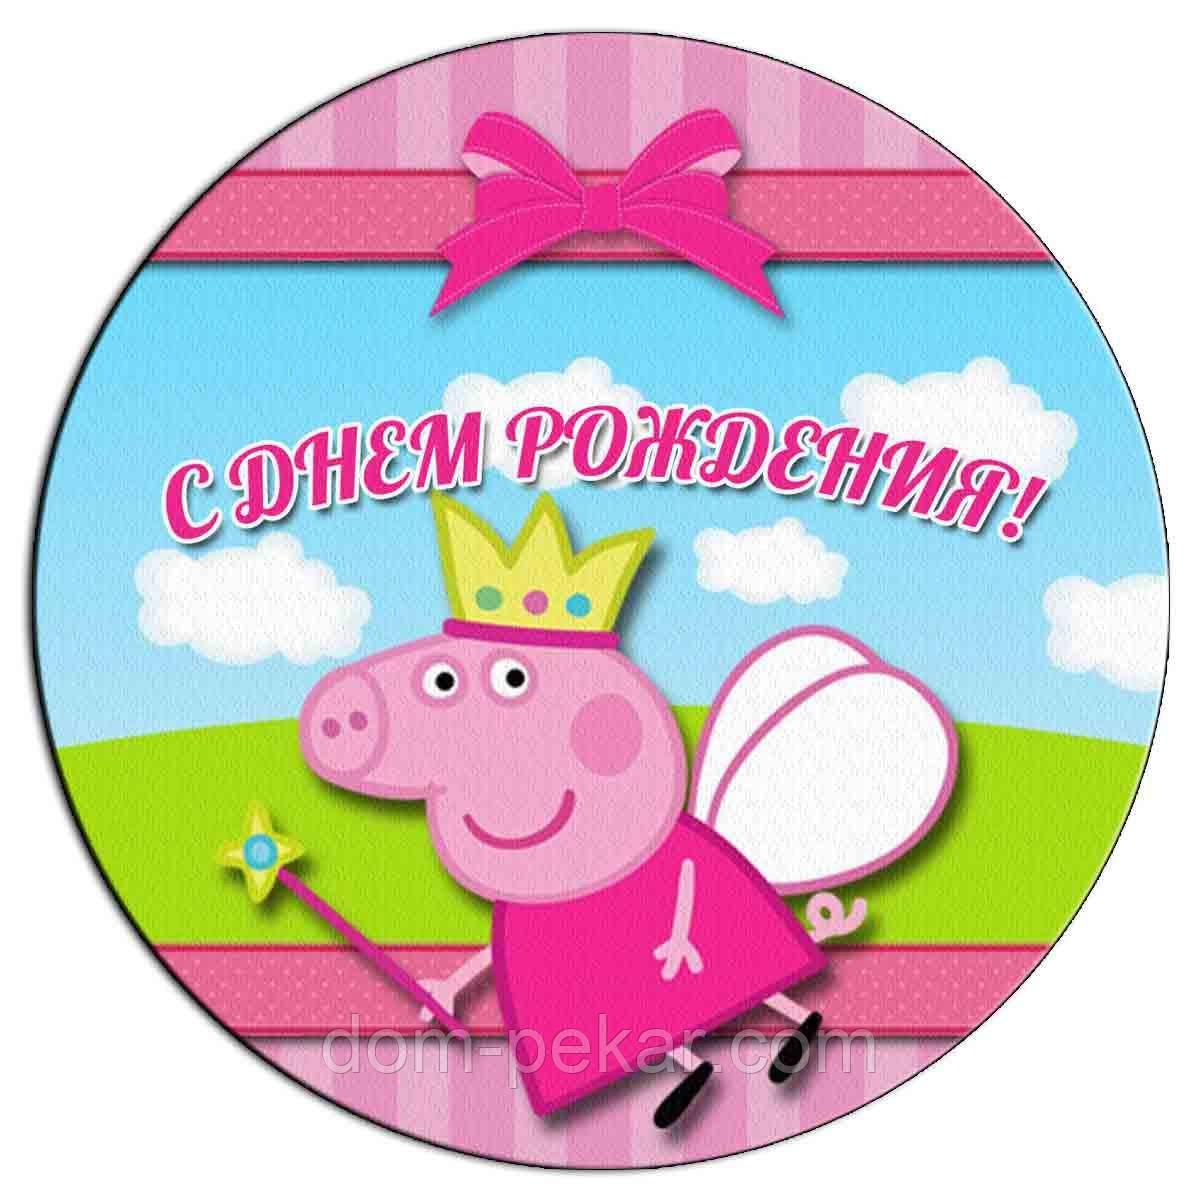 Свинка Пеппа 2 вафельная картинка от интернет-магазина ...